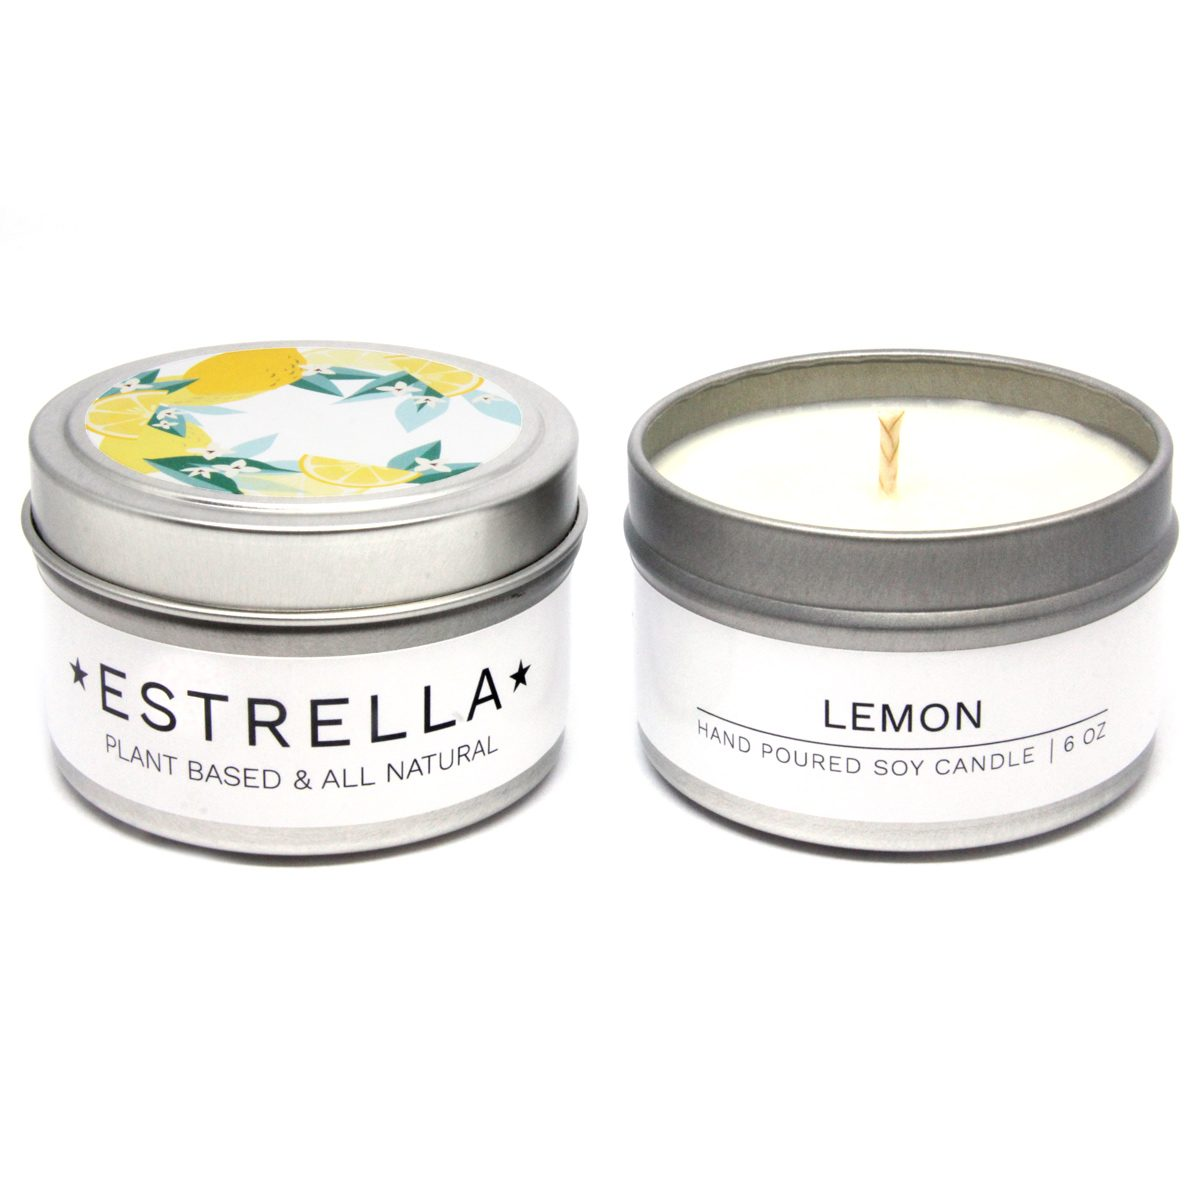 Tin-Lemon